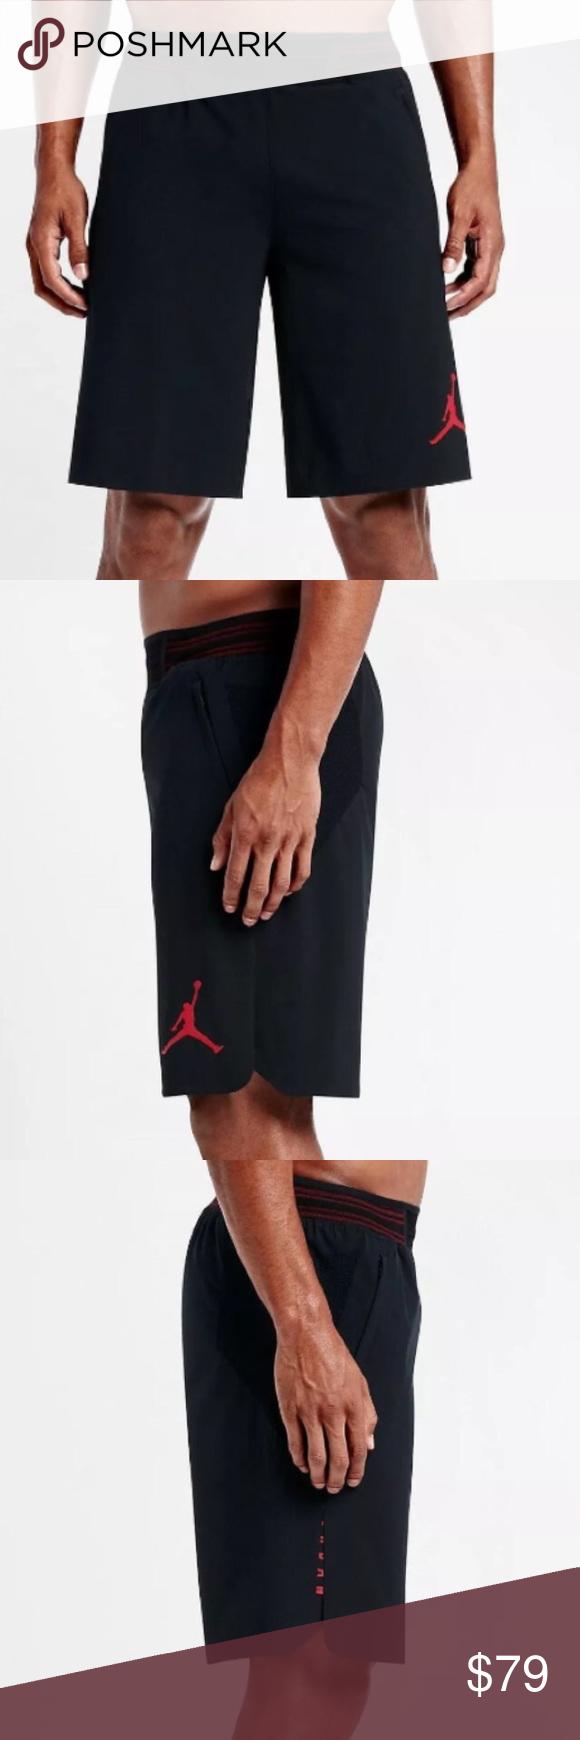 189714db656f7b NWT Nike Jordan 23 Tech Flex Hyperweave Shorts MEN S NIKE JORDAN 23 TECH  FLEX HYPERWEAVE RUNNING